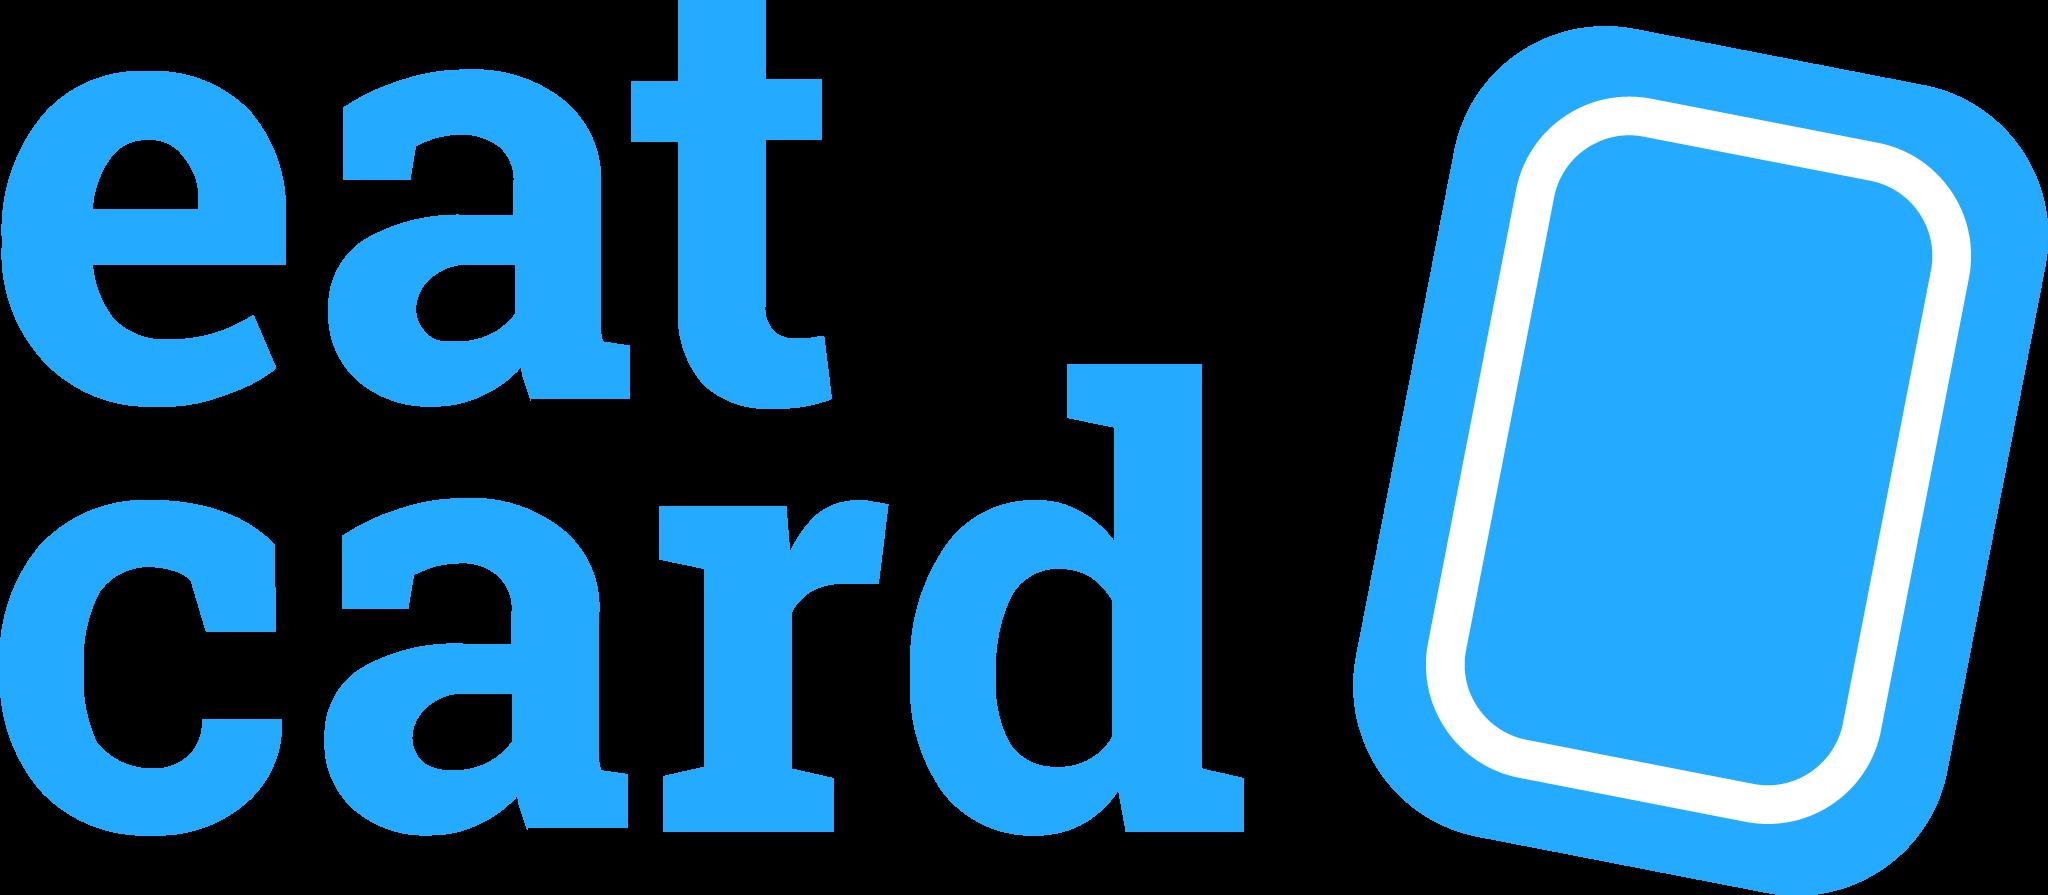 Eatcard